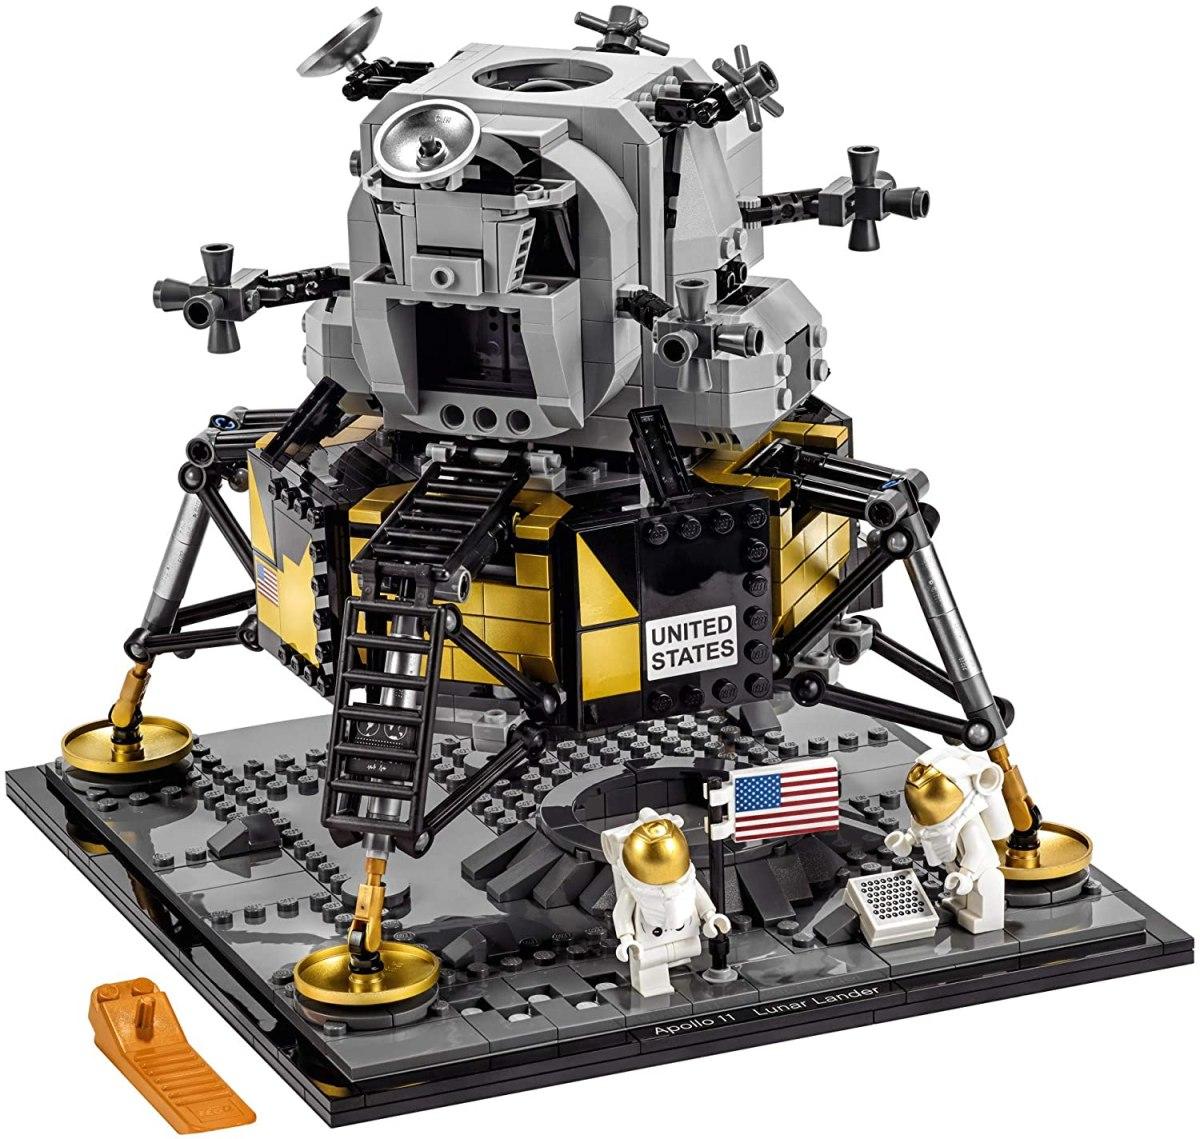 Wonderful LEGO NASA Apollo 11 Lunar Lander | Boing Boing